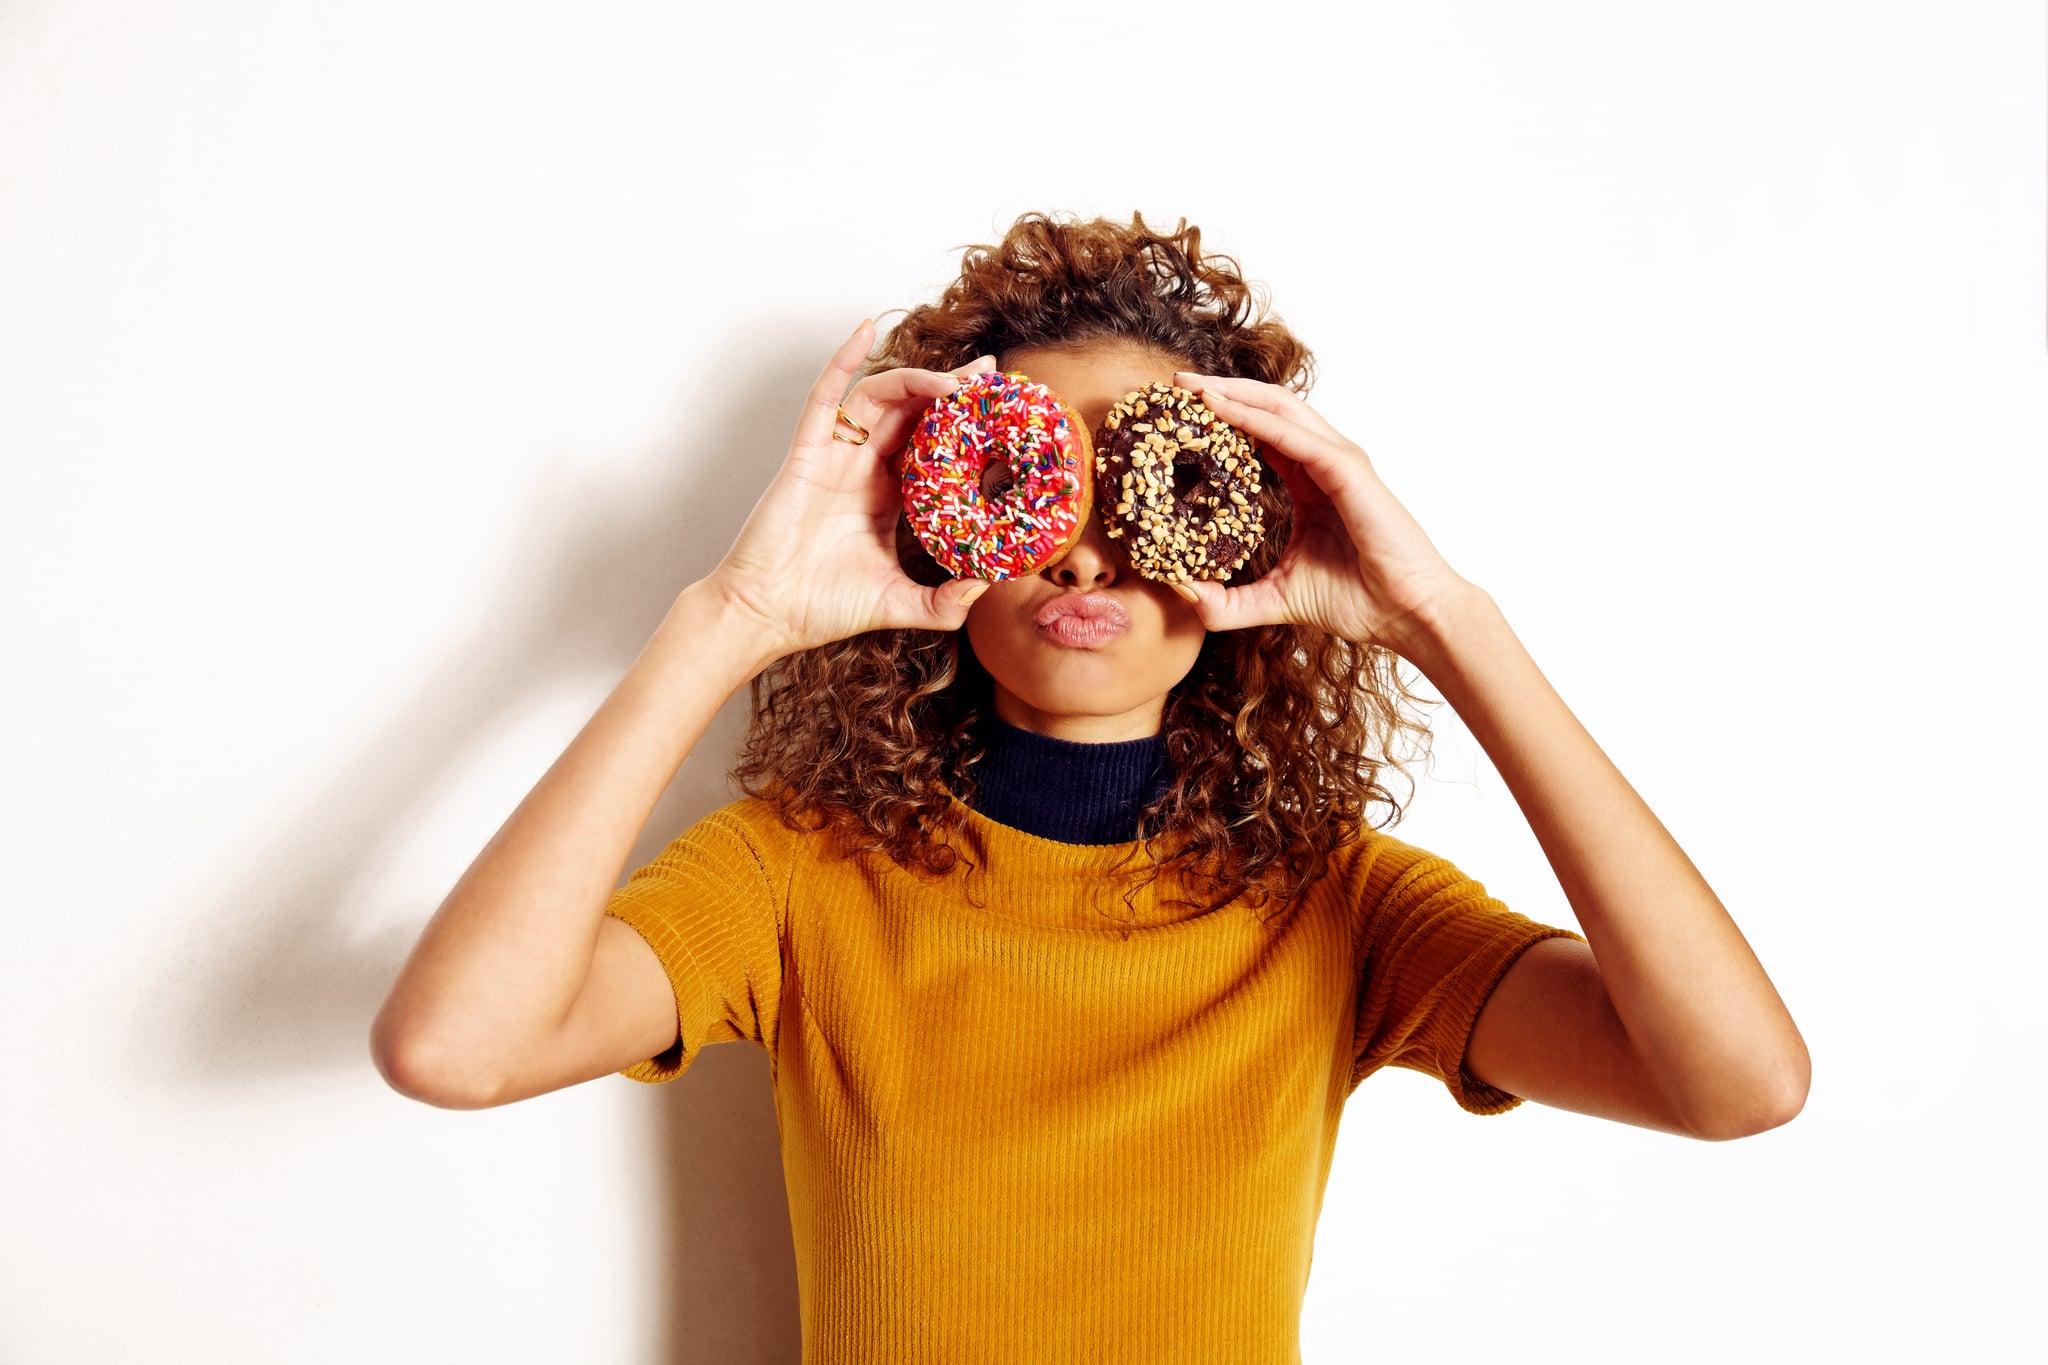 Lack of Sleep Linked to Bad Eating Habits | POPSUGAR Fitness